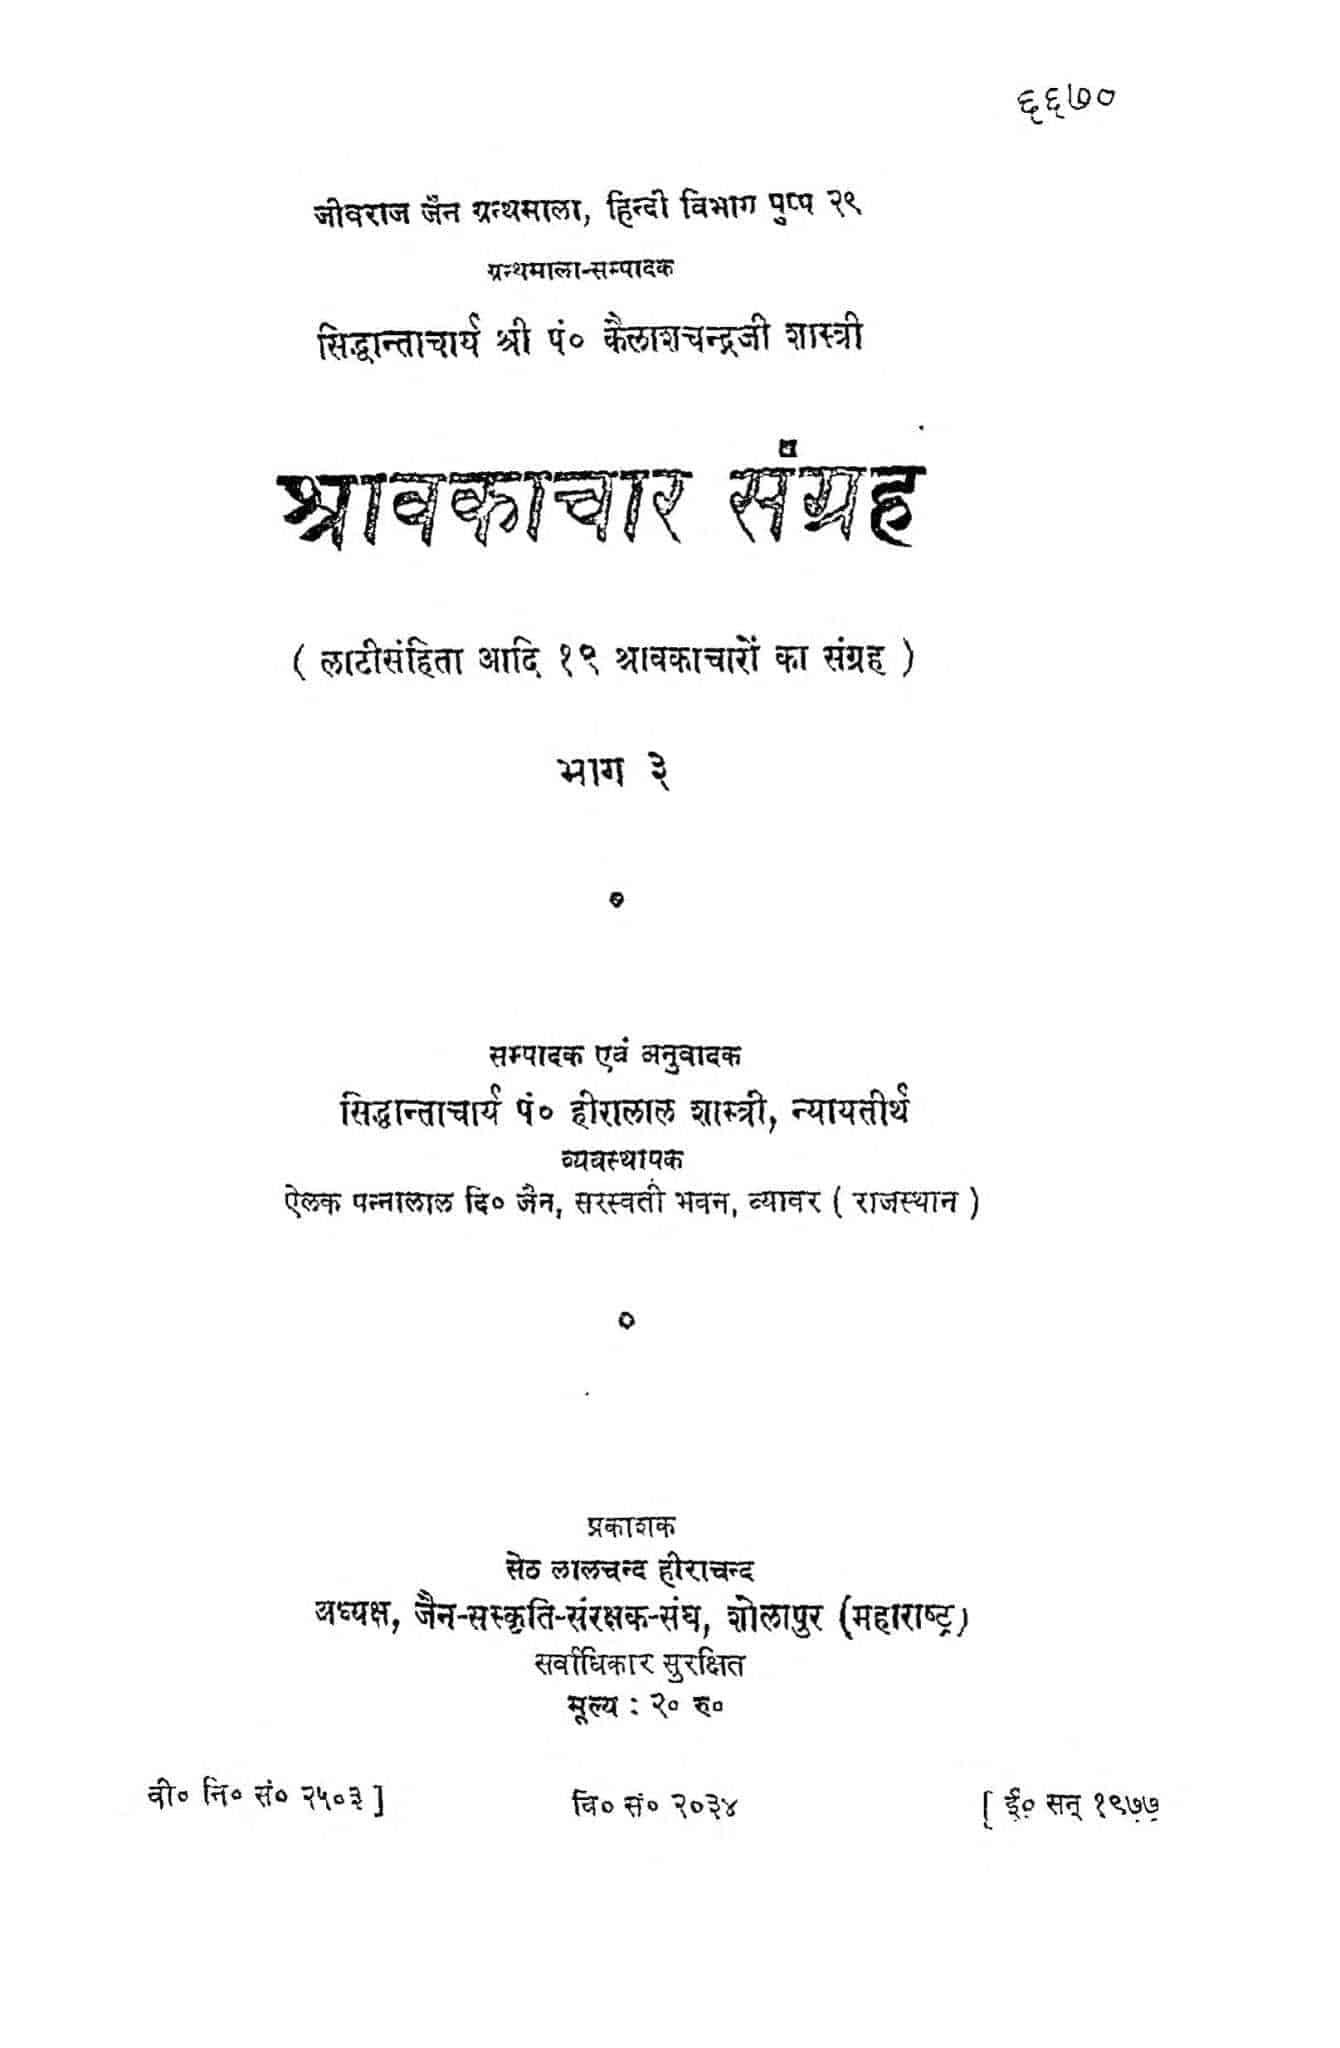 Book Image : श्रावकाचार संग्रह  - Shraavkachar Sangrah